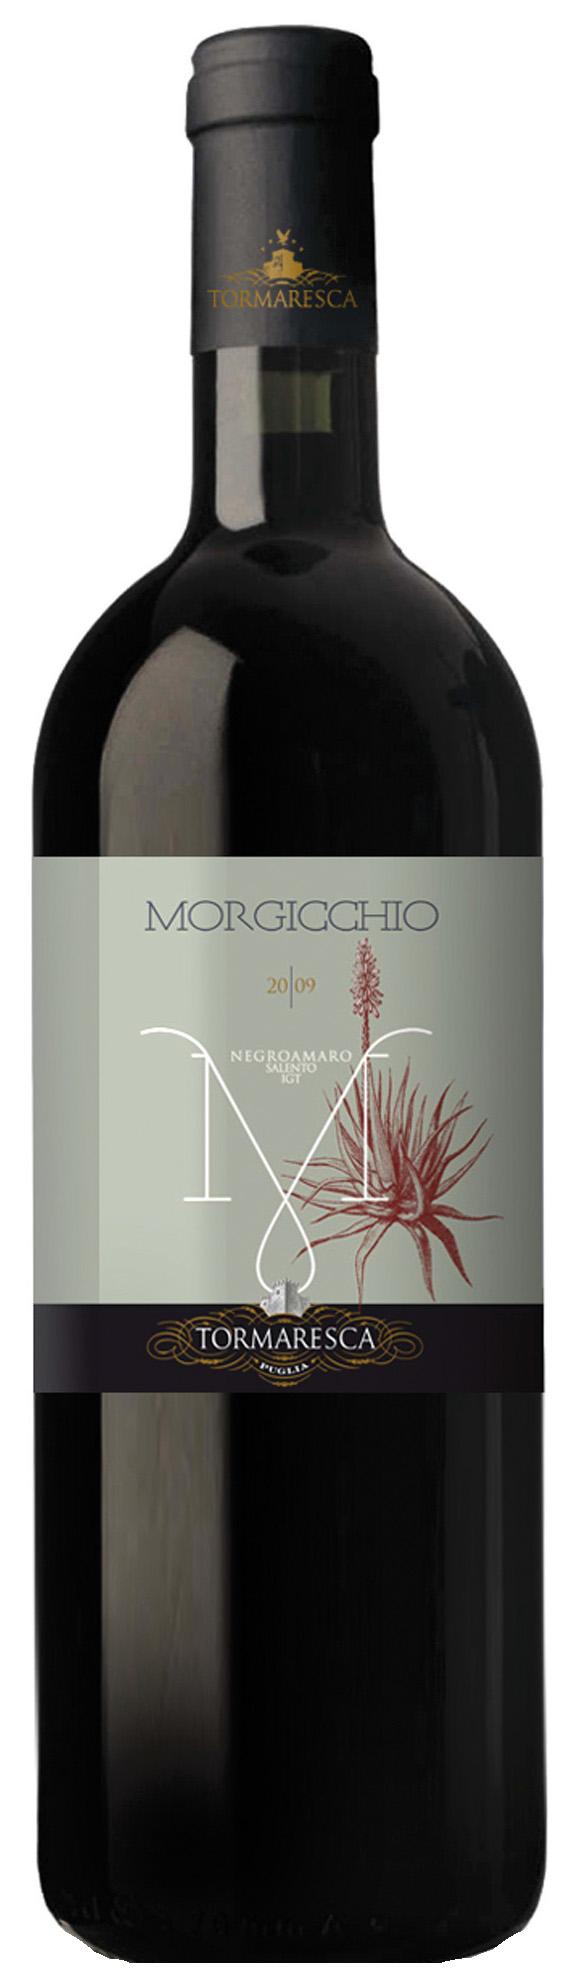 2012 Morgicchio Negroamaro IGT Tormaresca